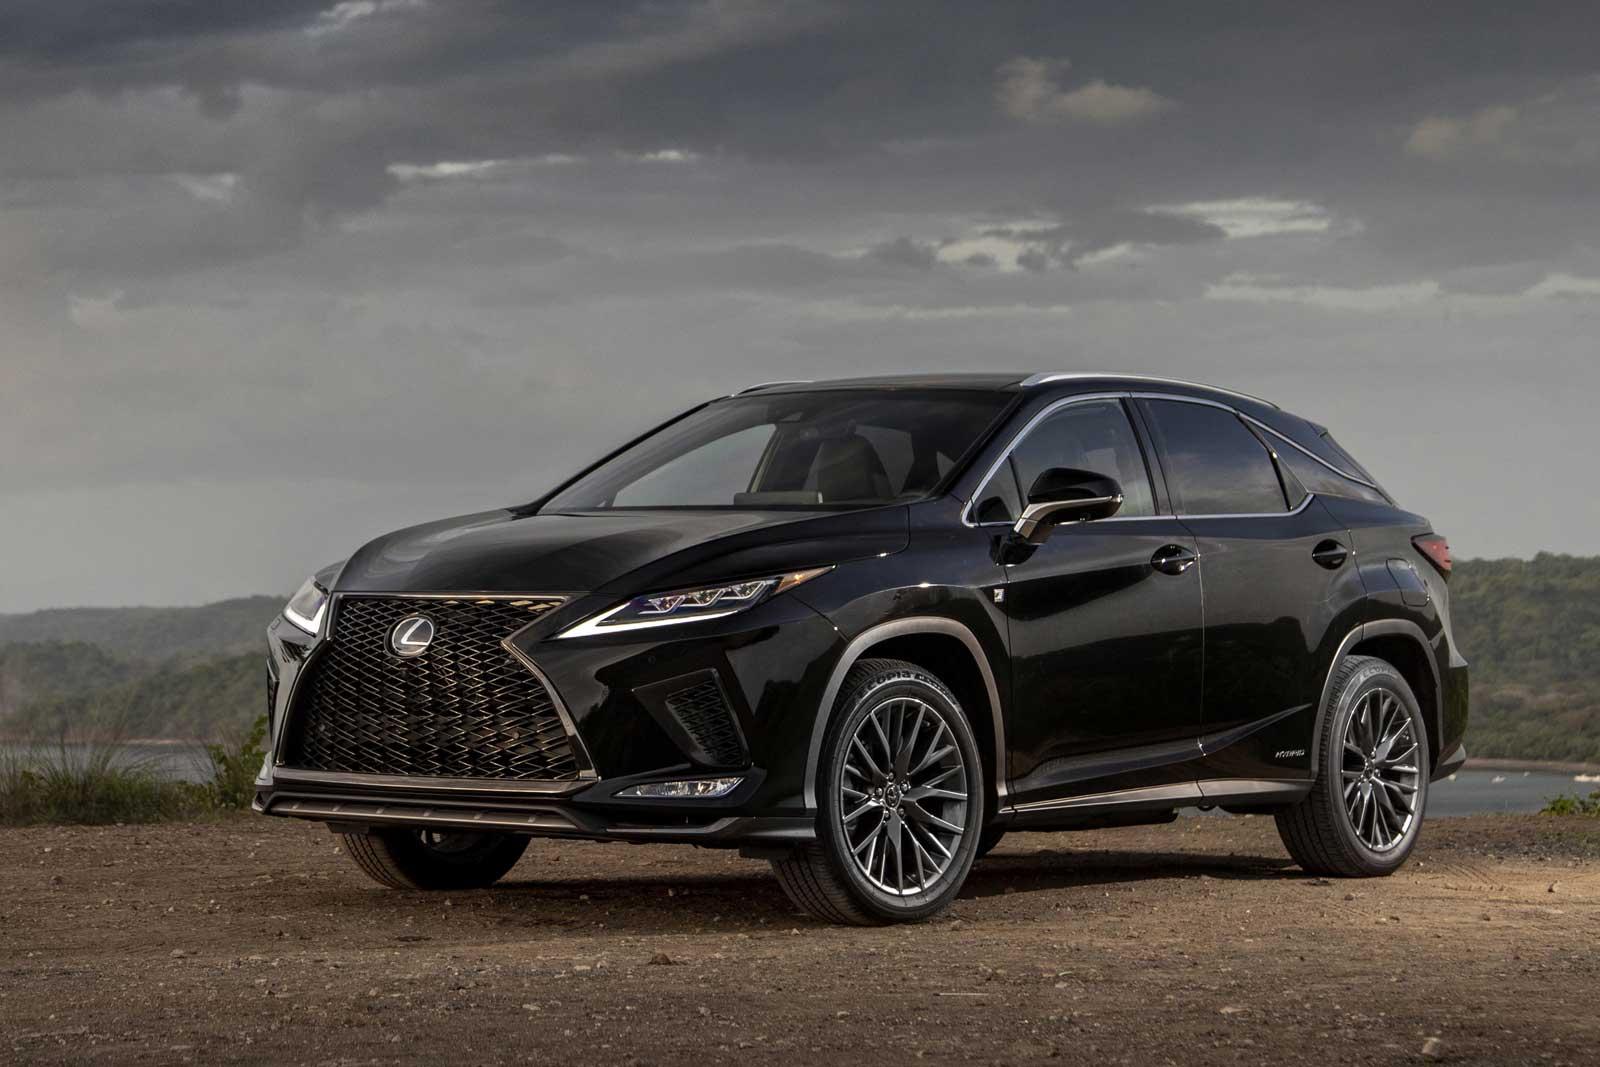 Most popular luxury SUVs